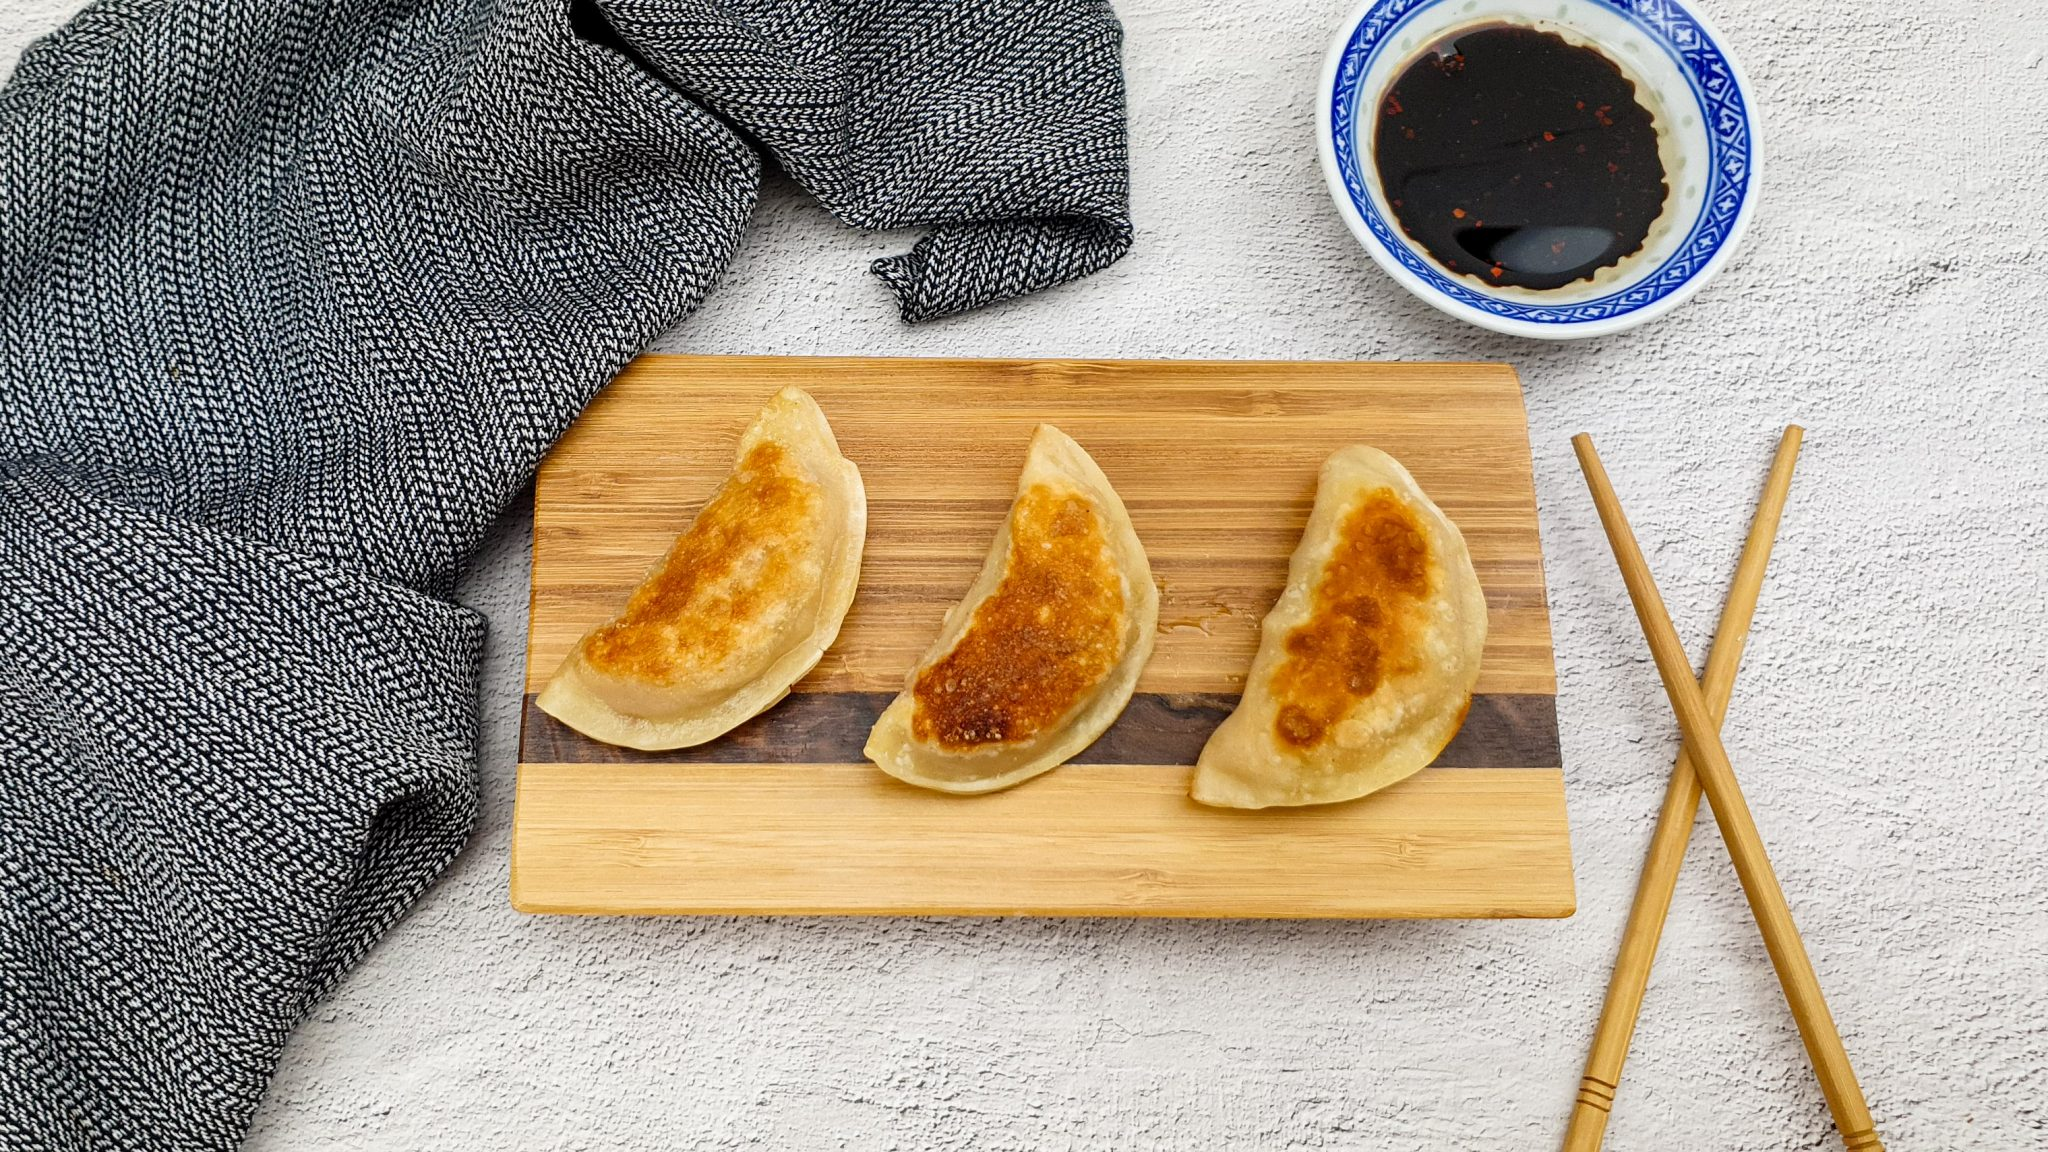 Koreaanse dumplings